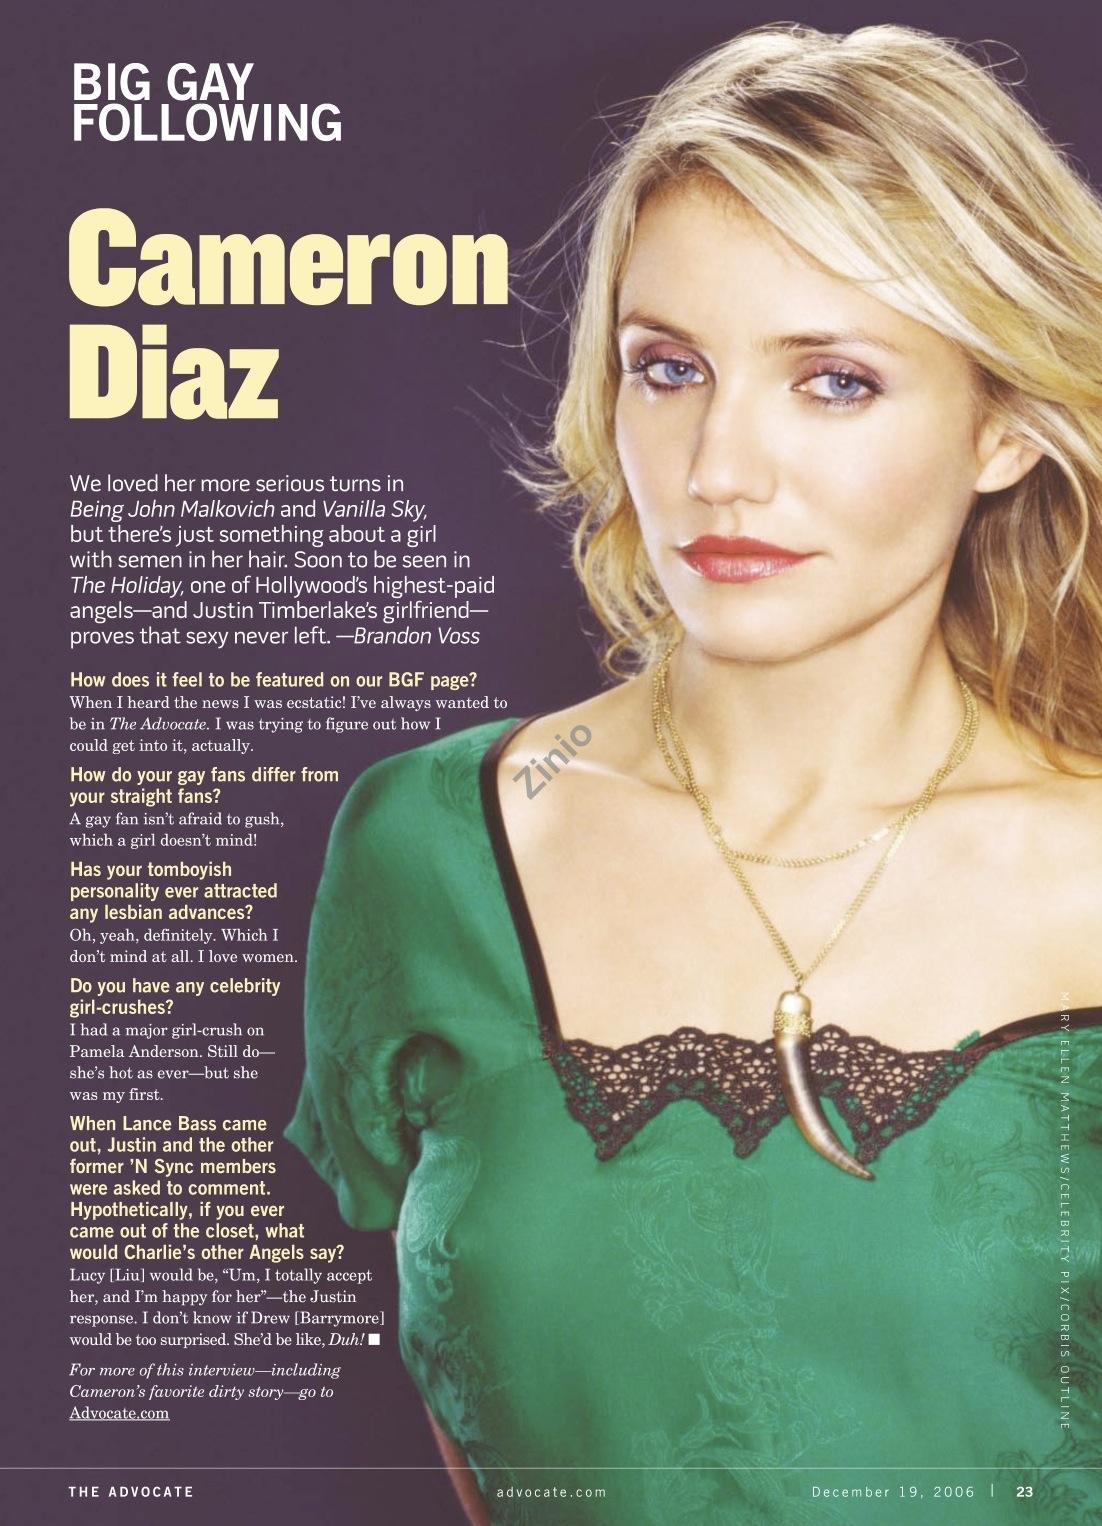 Cameron Diaz advocate bgf.jpg